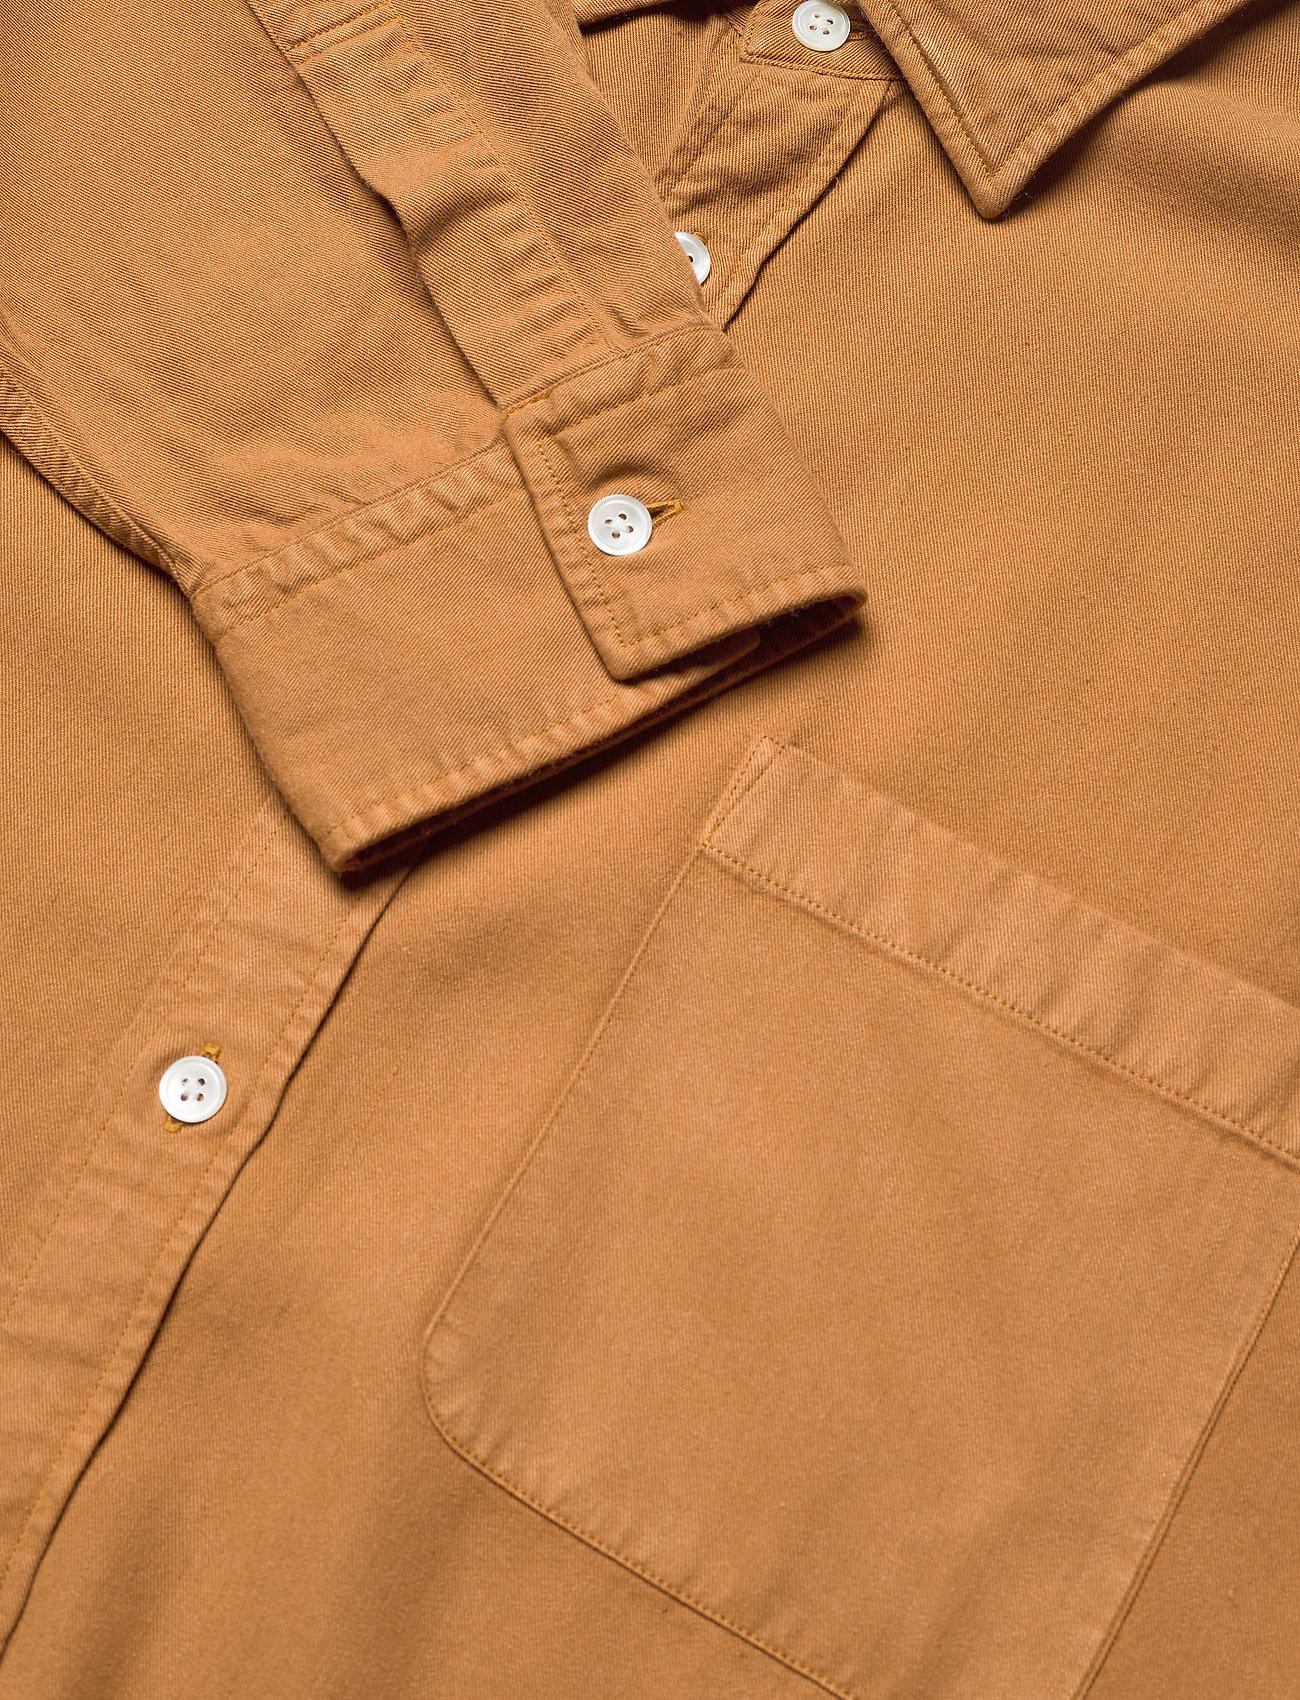 Deon Shirt 5161 (Mustard) (101.40 €) - NN07 SDQBP